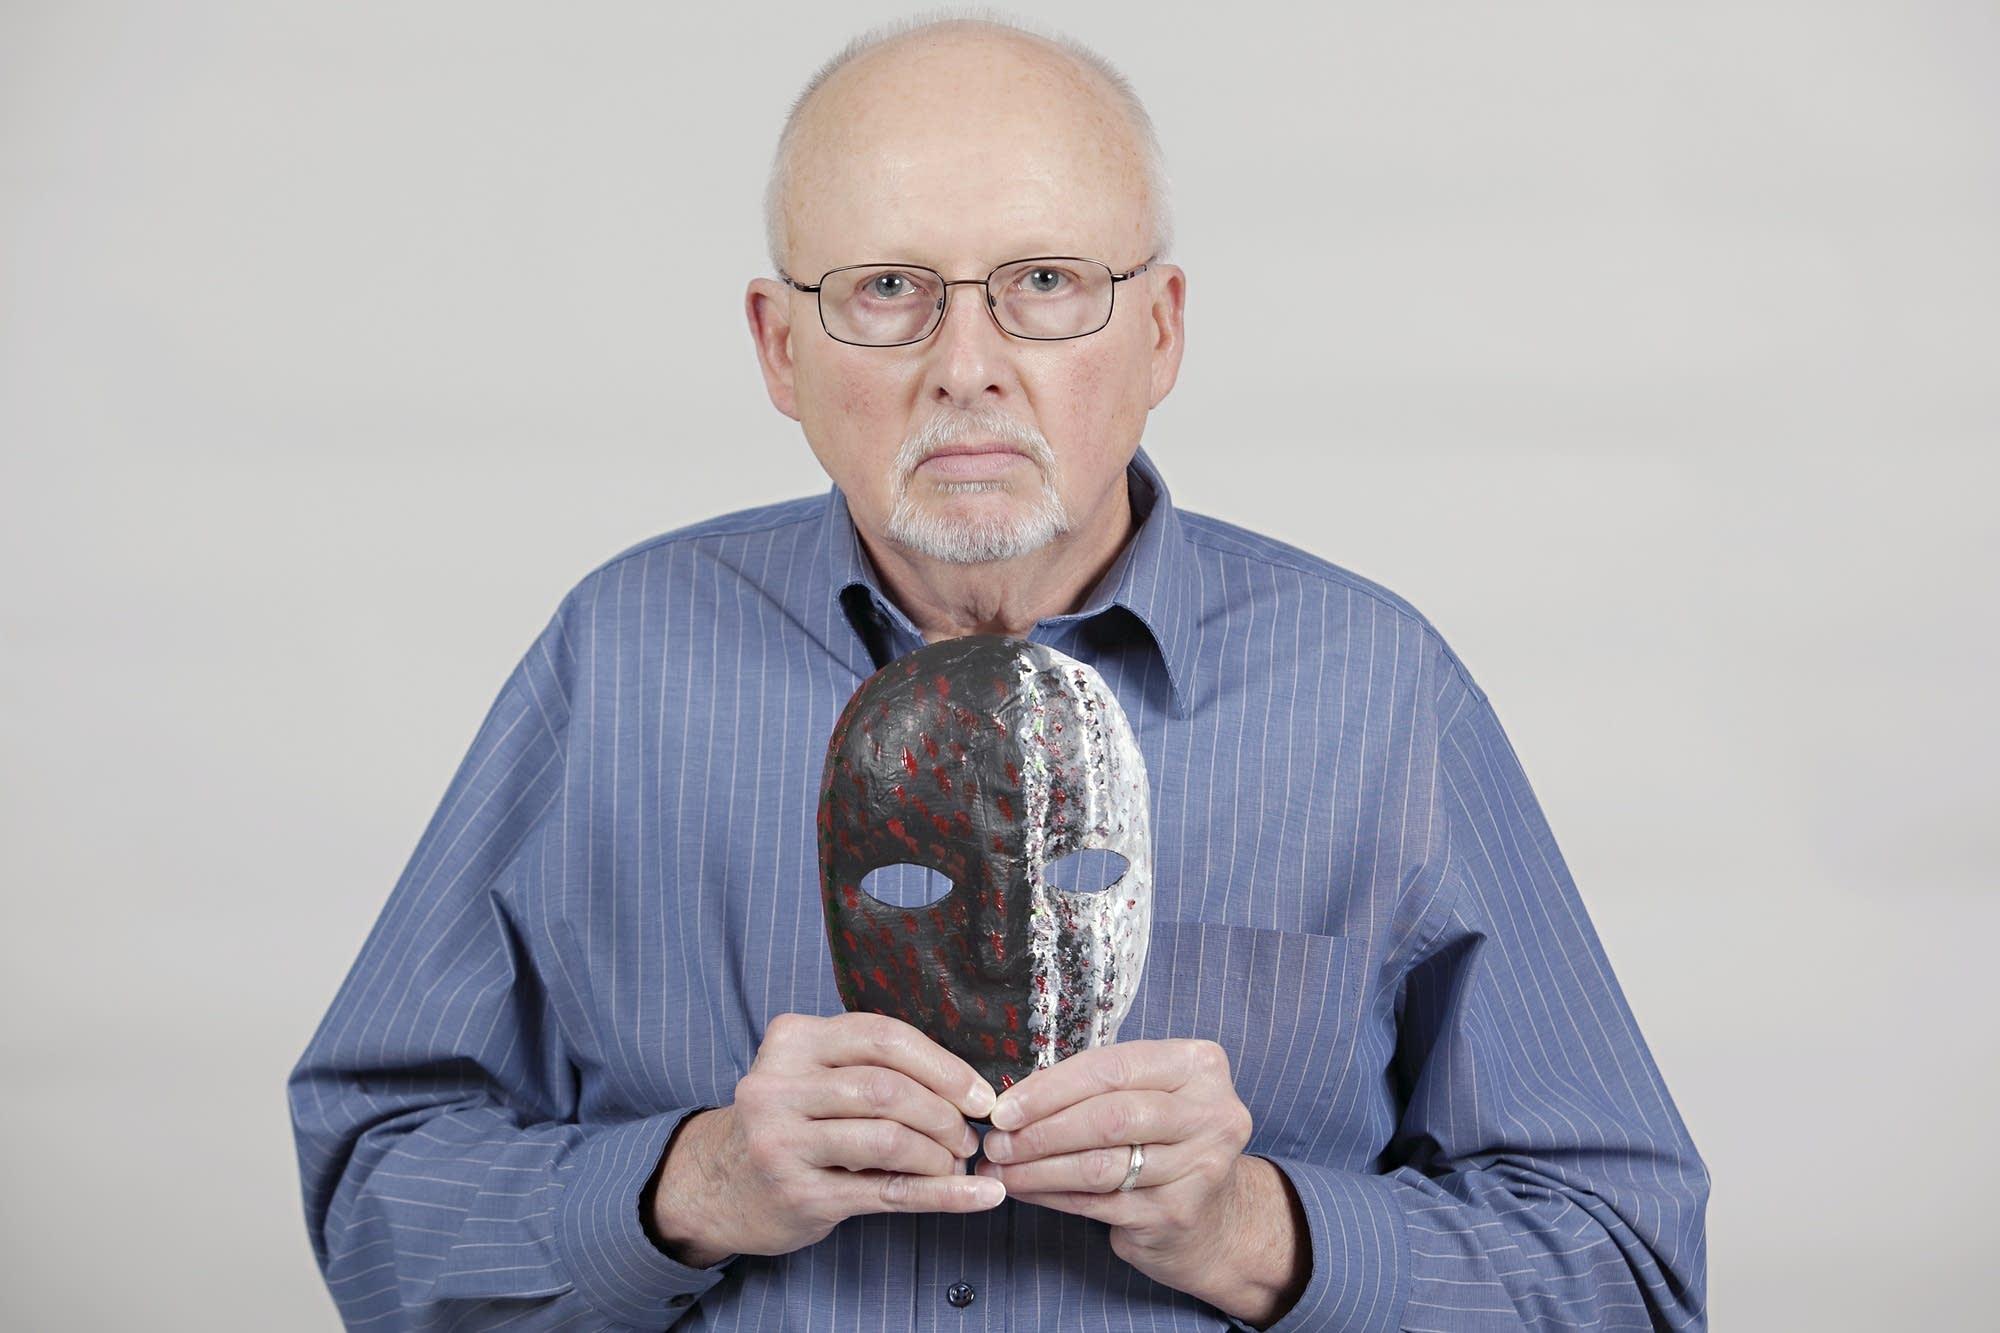 Army veteran Kirk Jensen, 70, of Fargo, N.D.